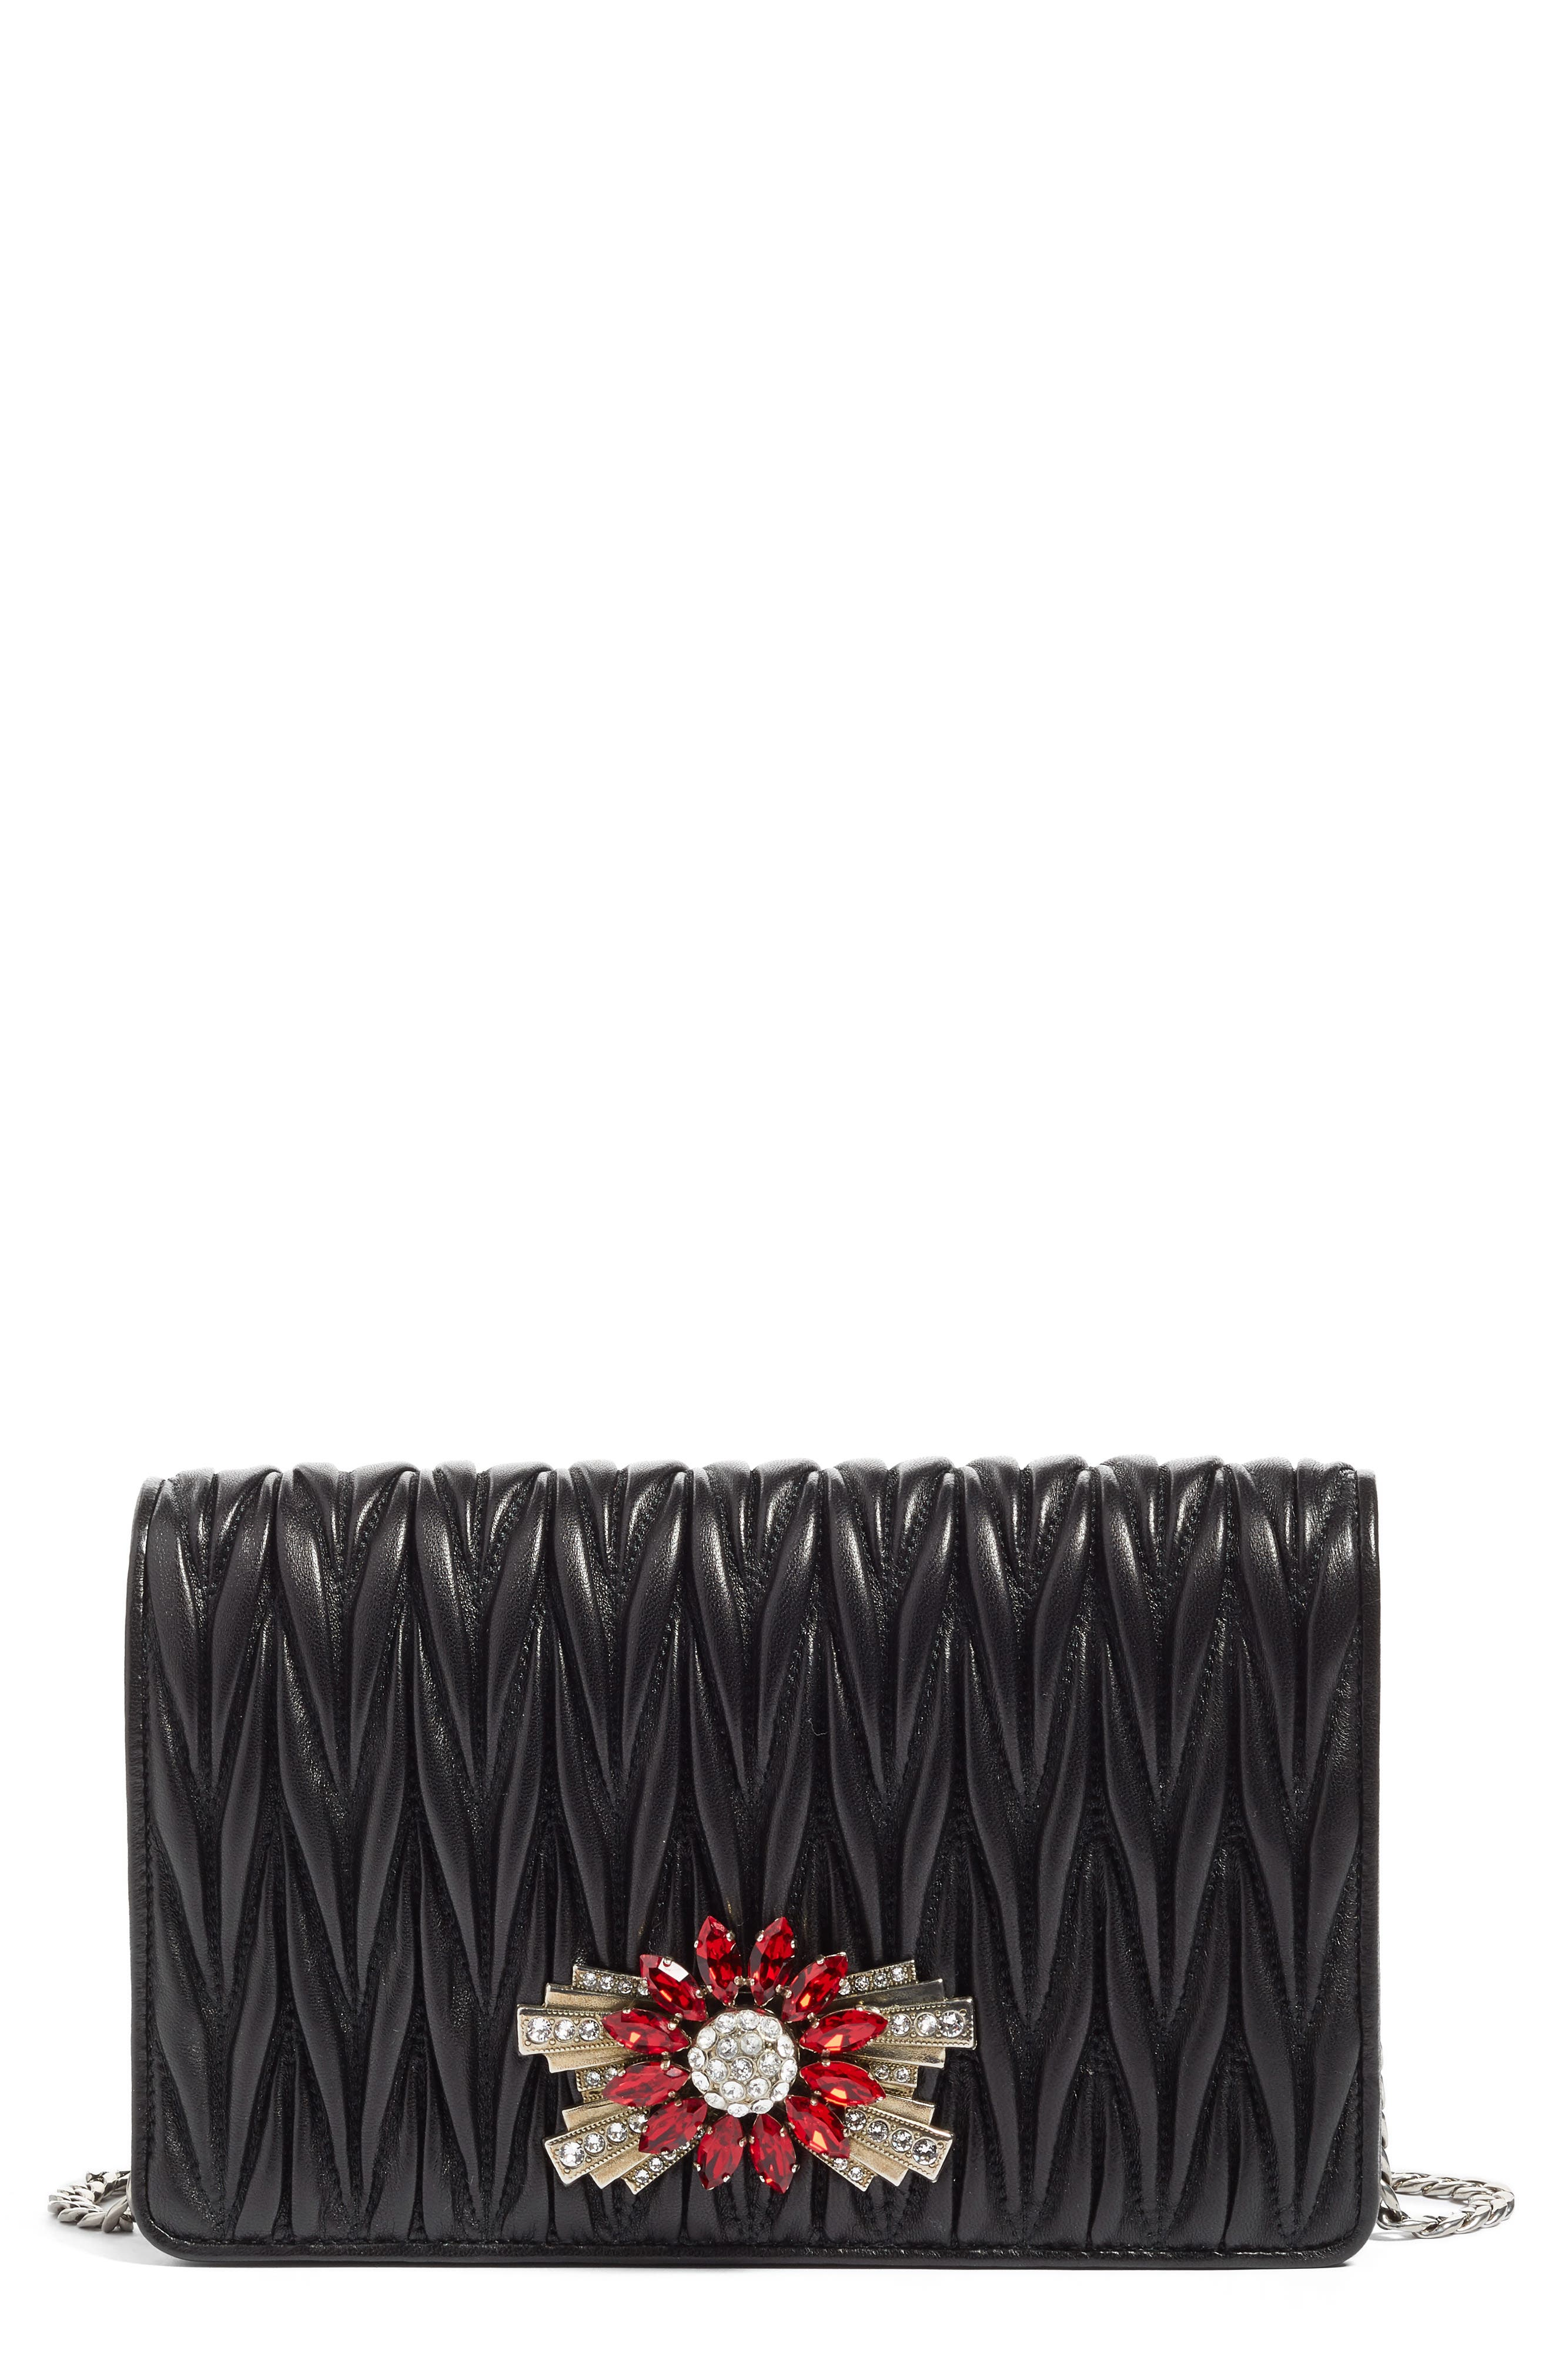 Main Image - Miu Miu Delice Matelassé Leather Wallet on a Chain